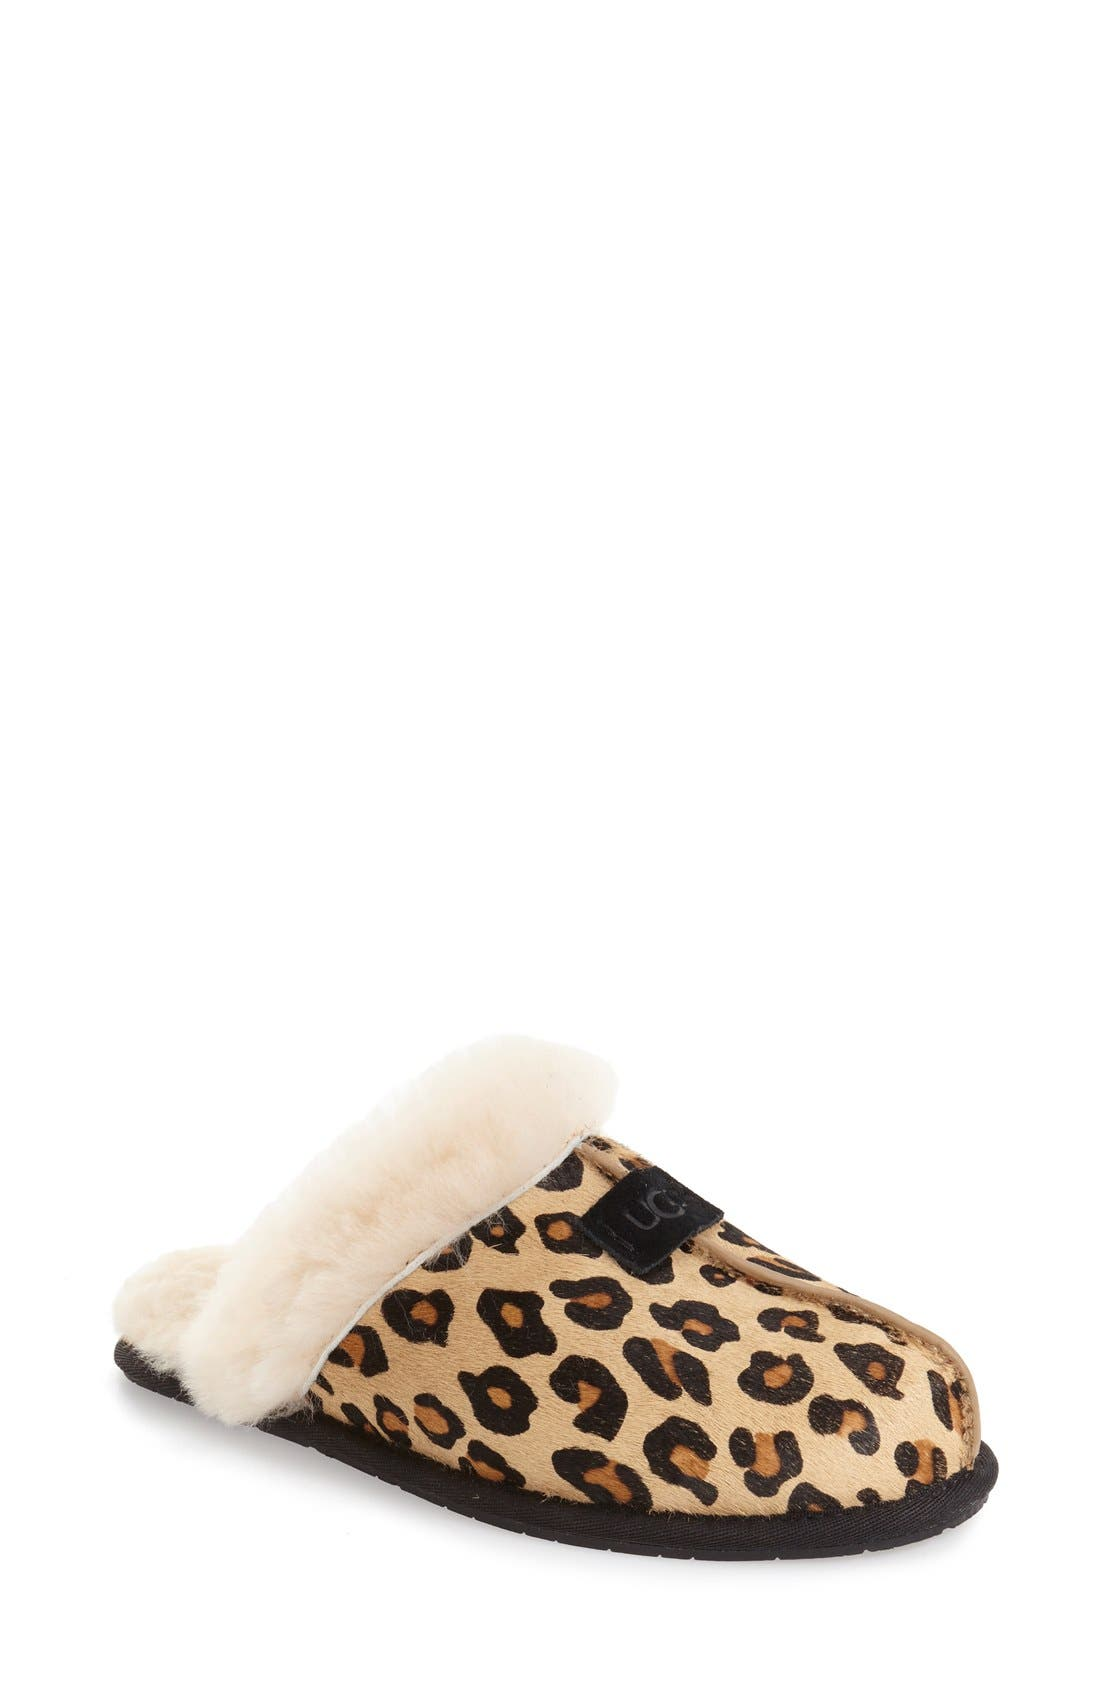 Scuffette II Leopard Spot Calf Hair Genuine Shearling Cuff Slipper,                             Main thumbnail 1, color,